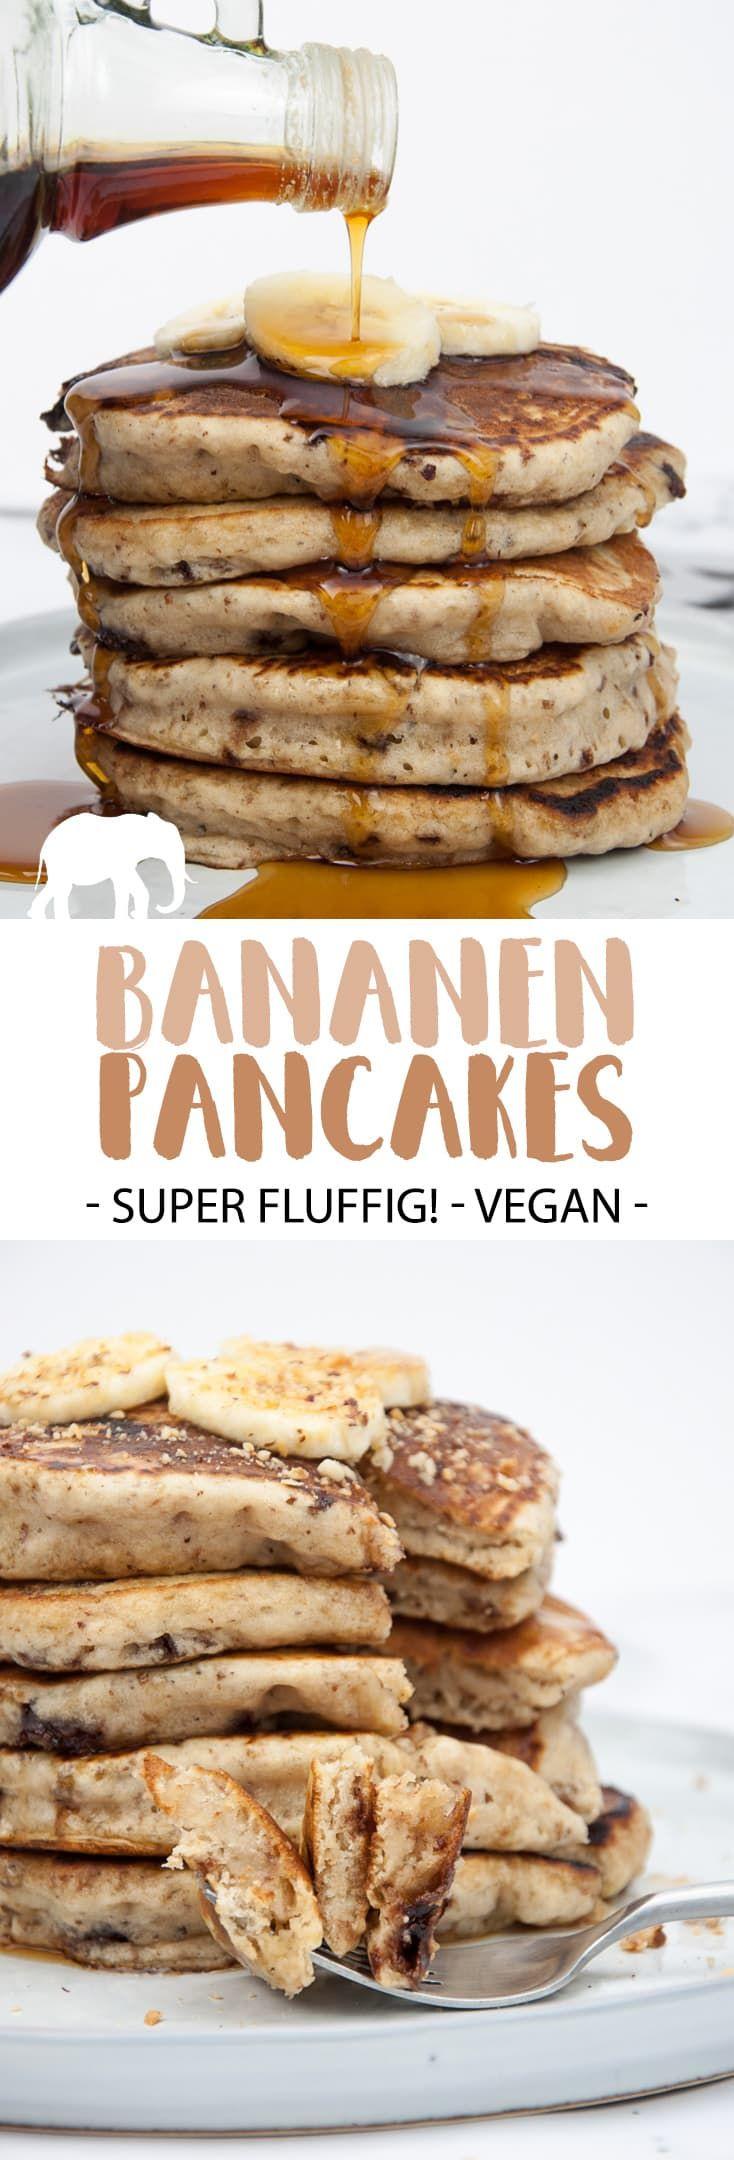 Fluffige Bananen Pancakes Mit Schokostückchen (Vegan) |  ElephantasticVegan.de #vegan #